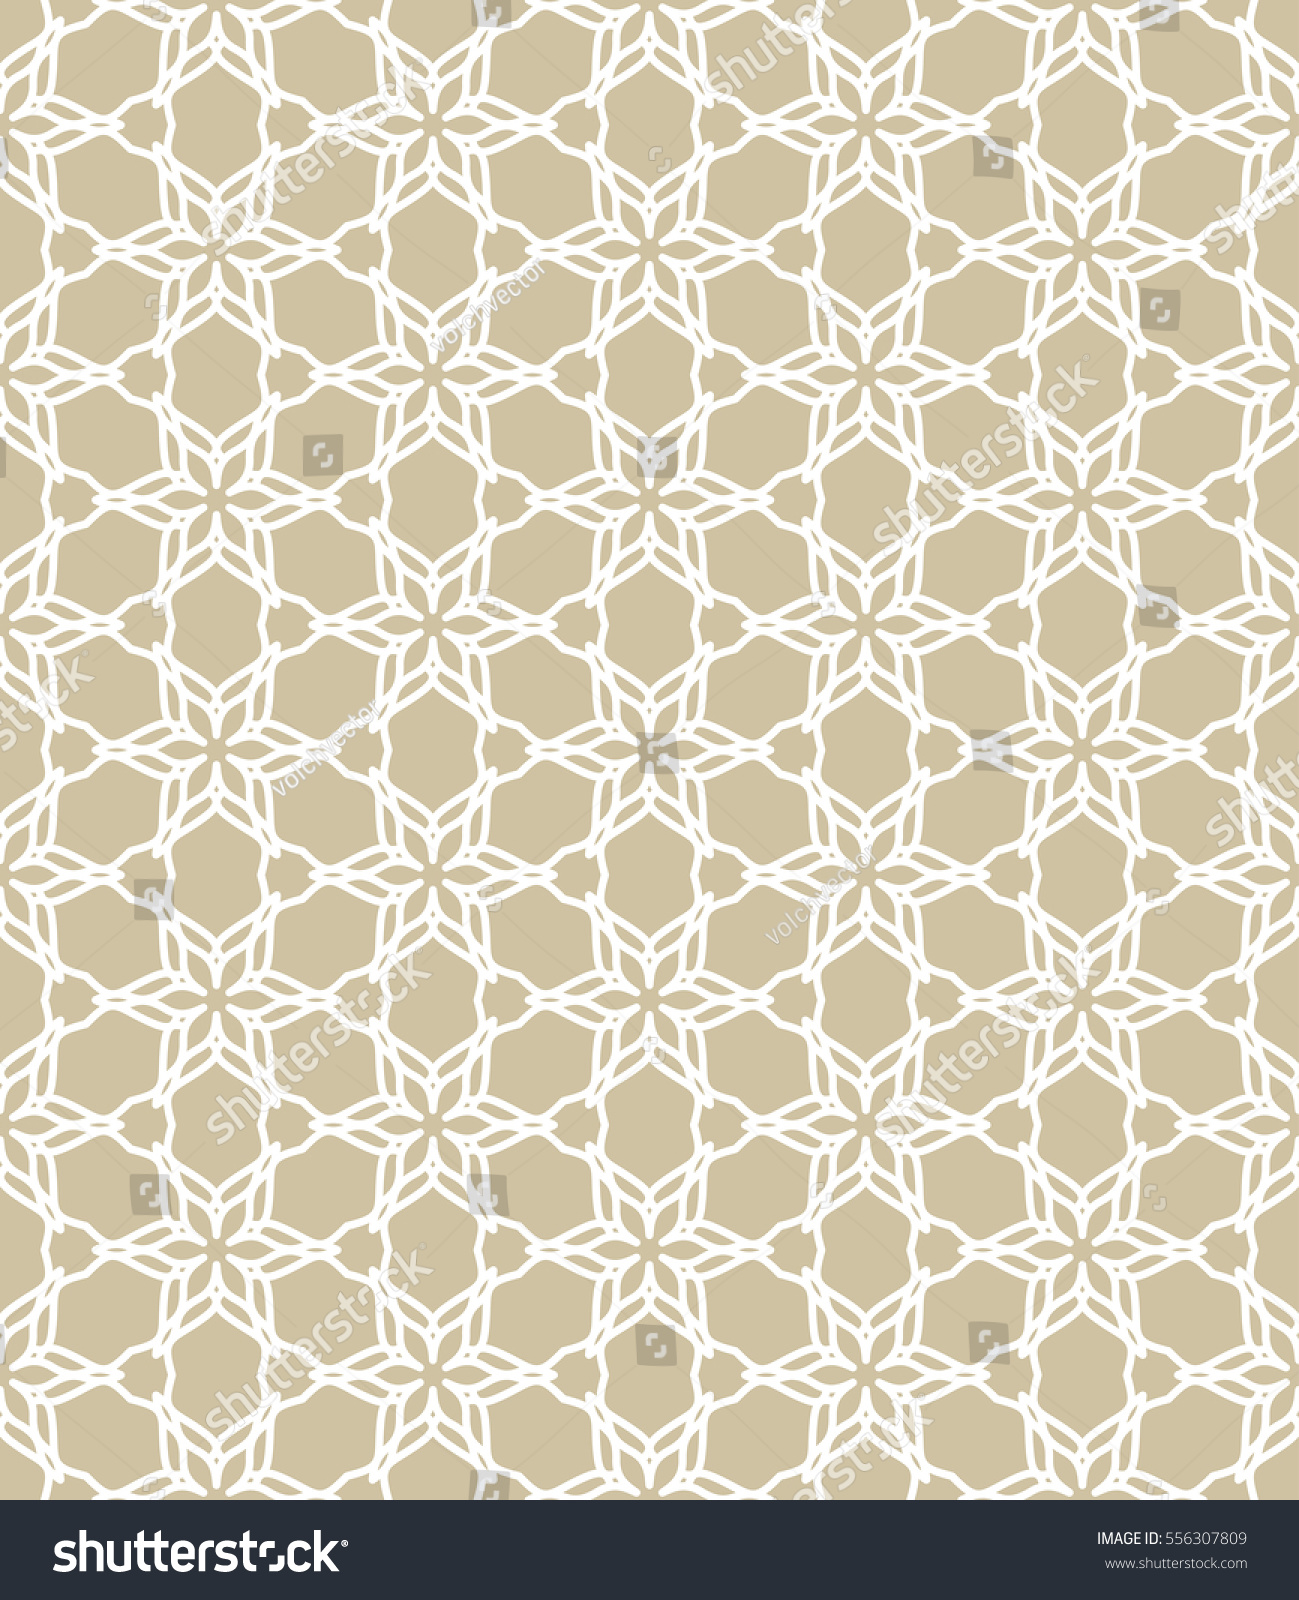 Line Texture Seamless : Seamless geometric line pattern arabian style stock vector